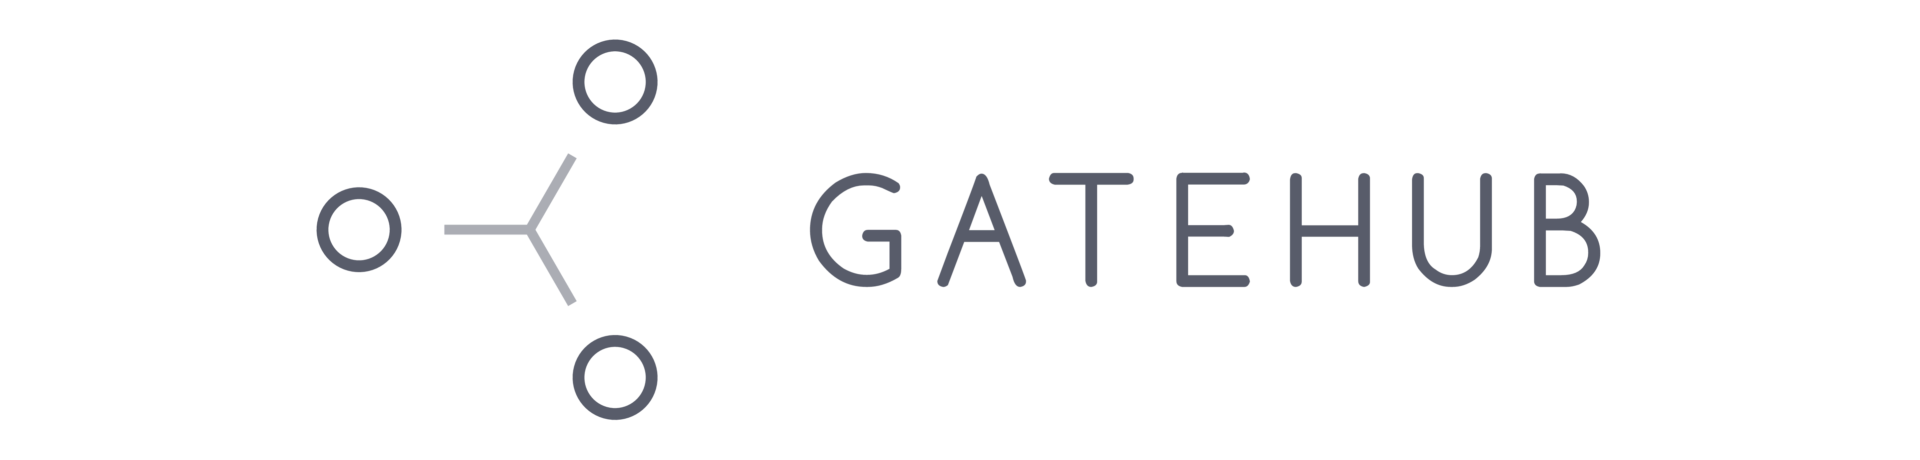 Gatehub Logo